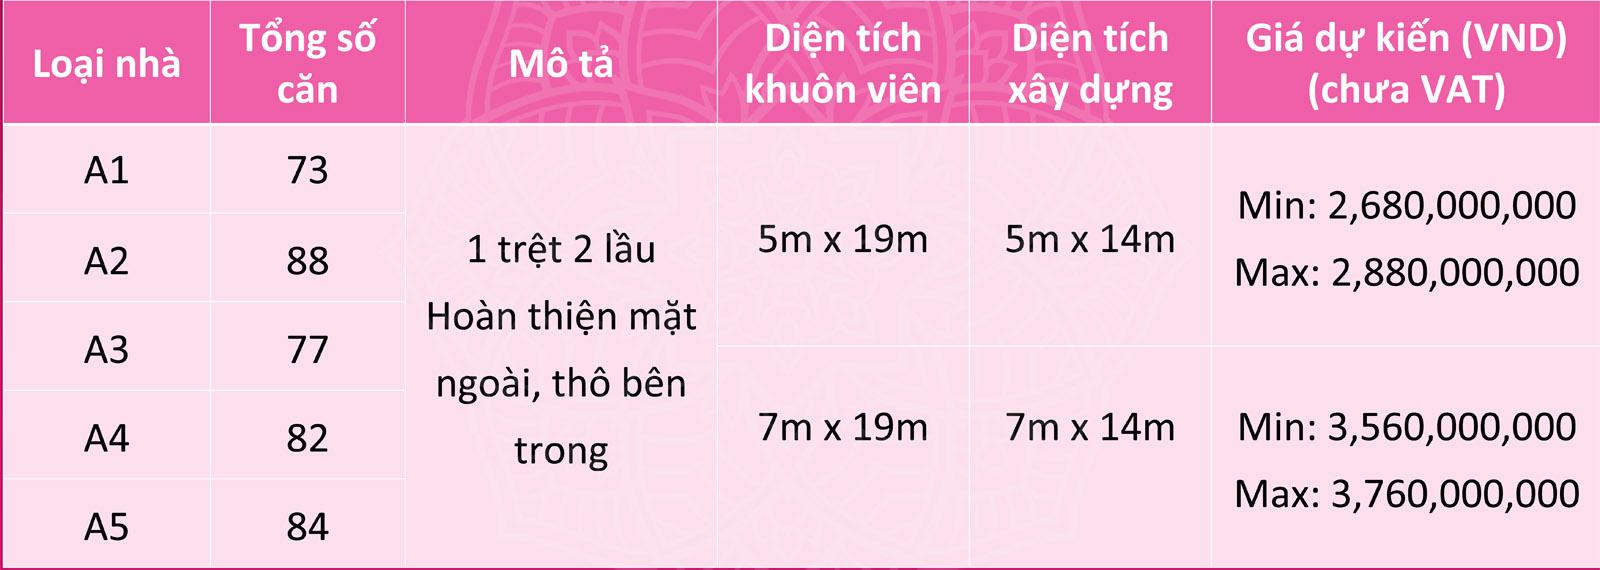 nha-pho-thuong-mai-bien